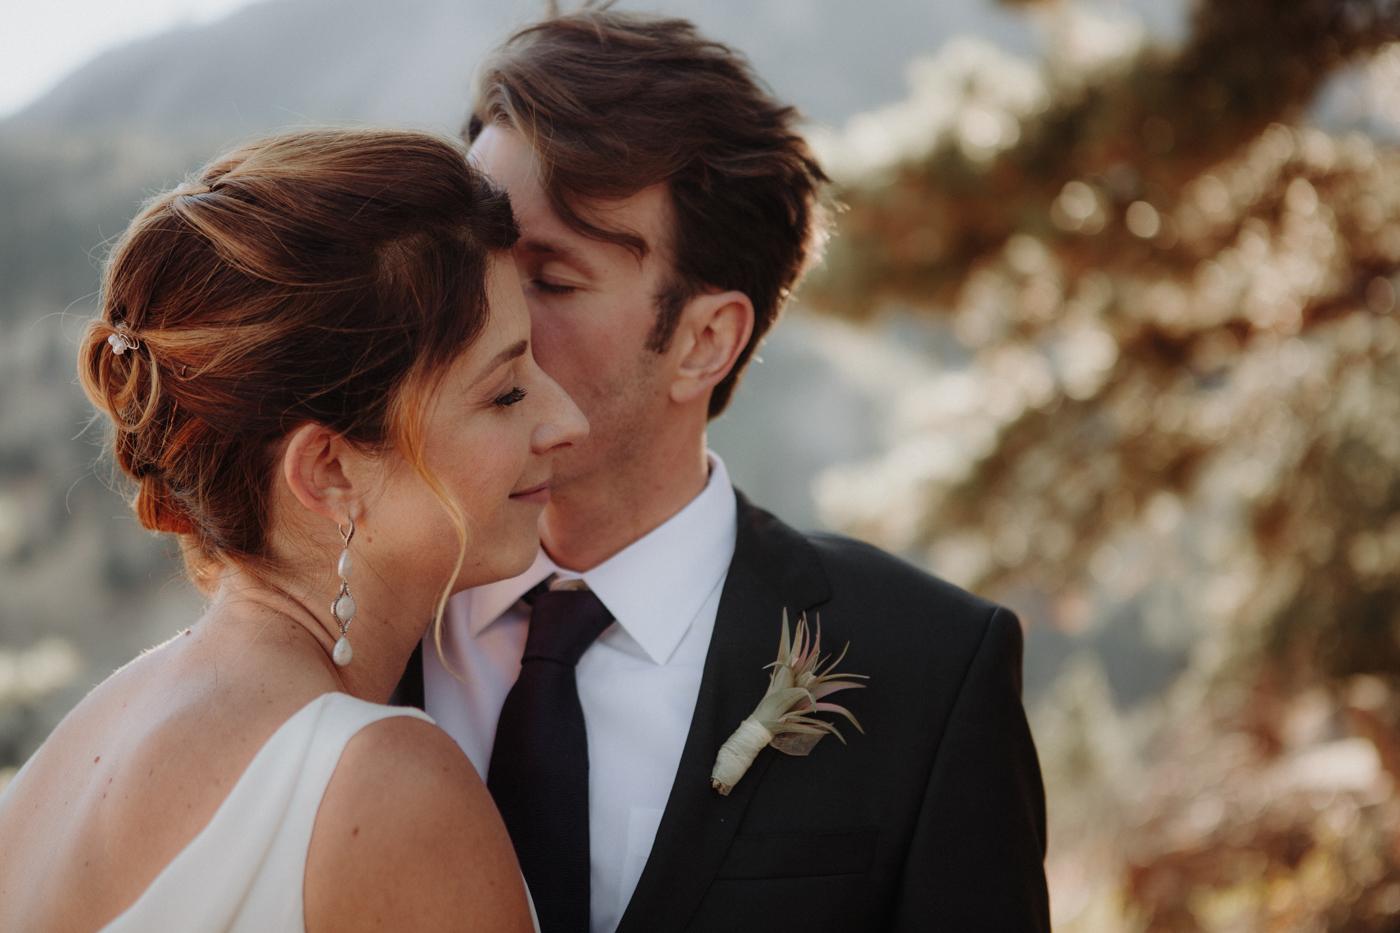 boulder-museum-modern-art-colorado-wedding-15.jpg